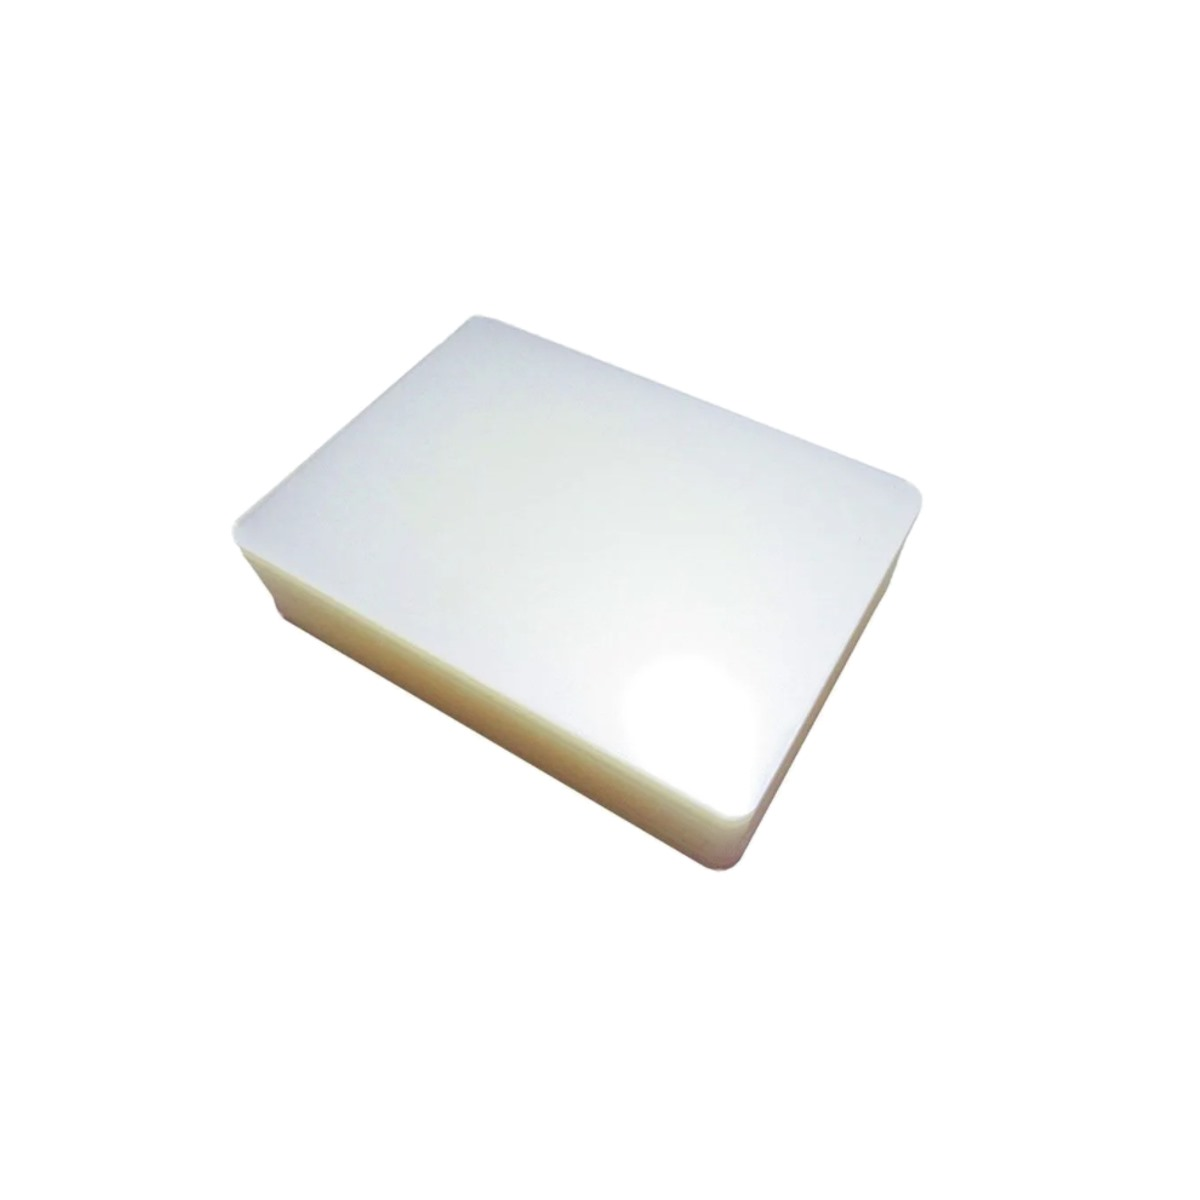 Polaseal plástico para plastificação Título Eleitor 70x100 0,10mm 100un